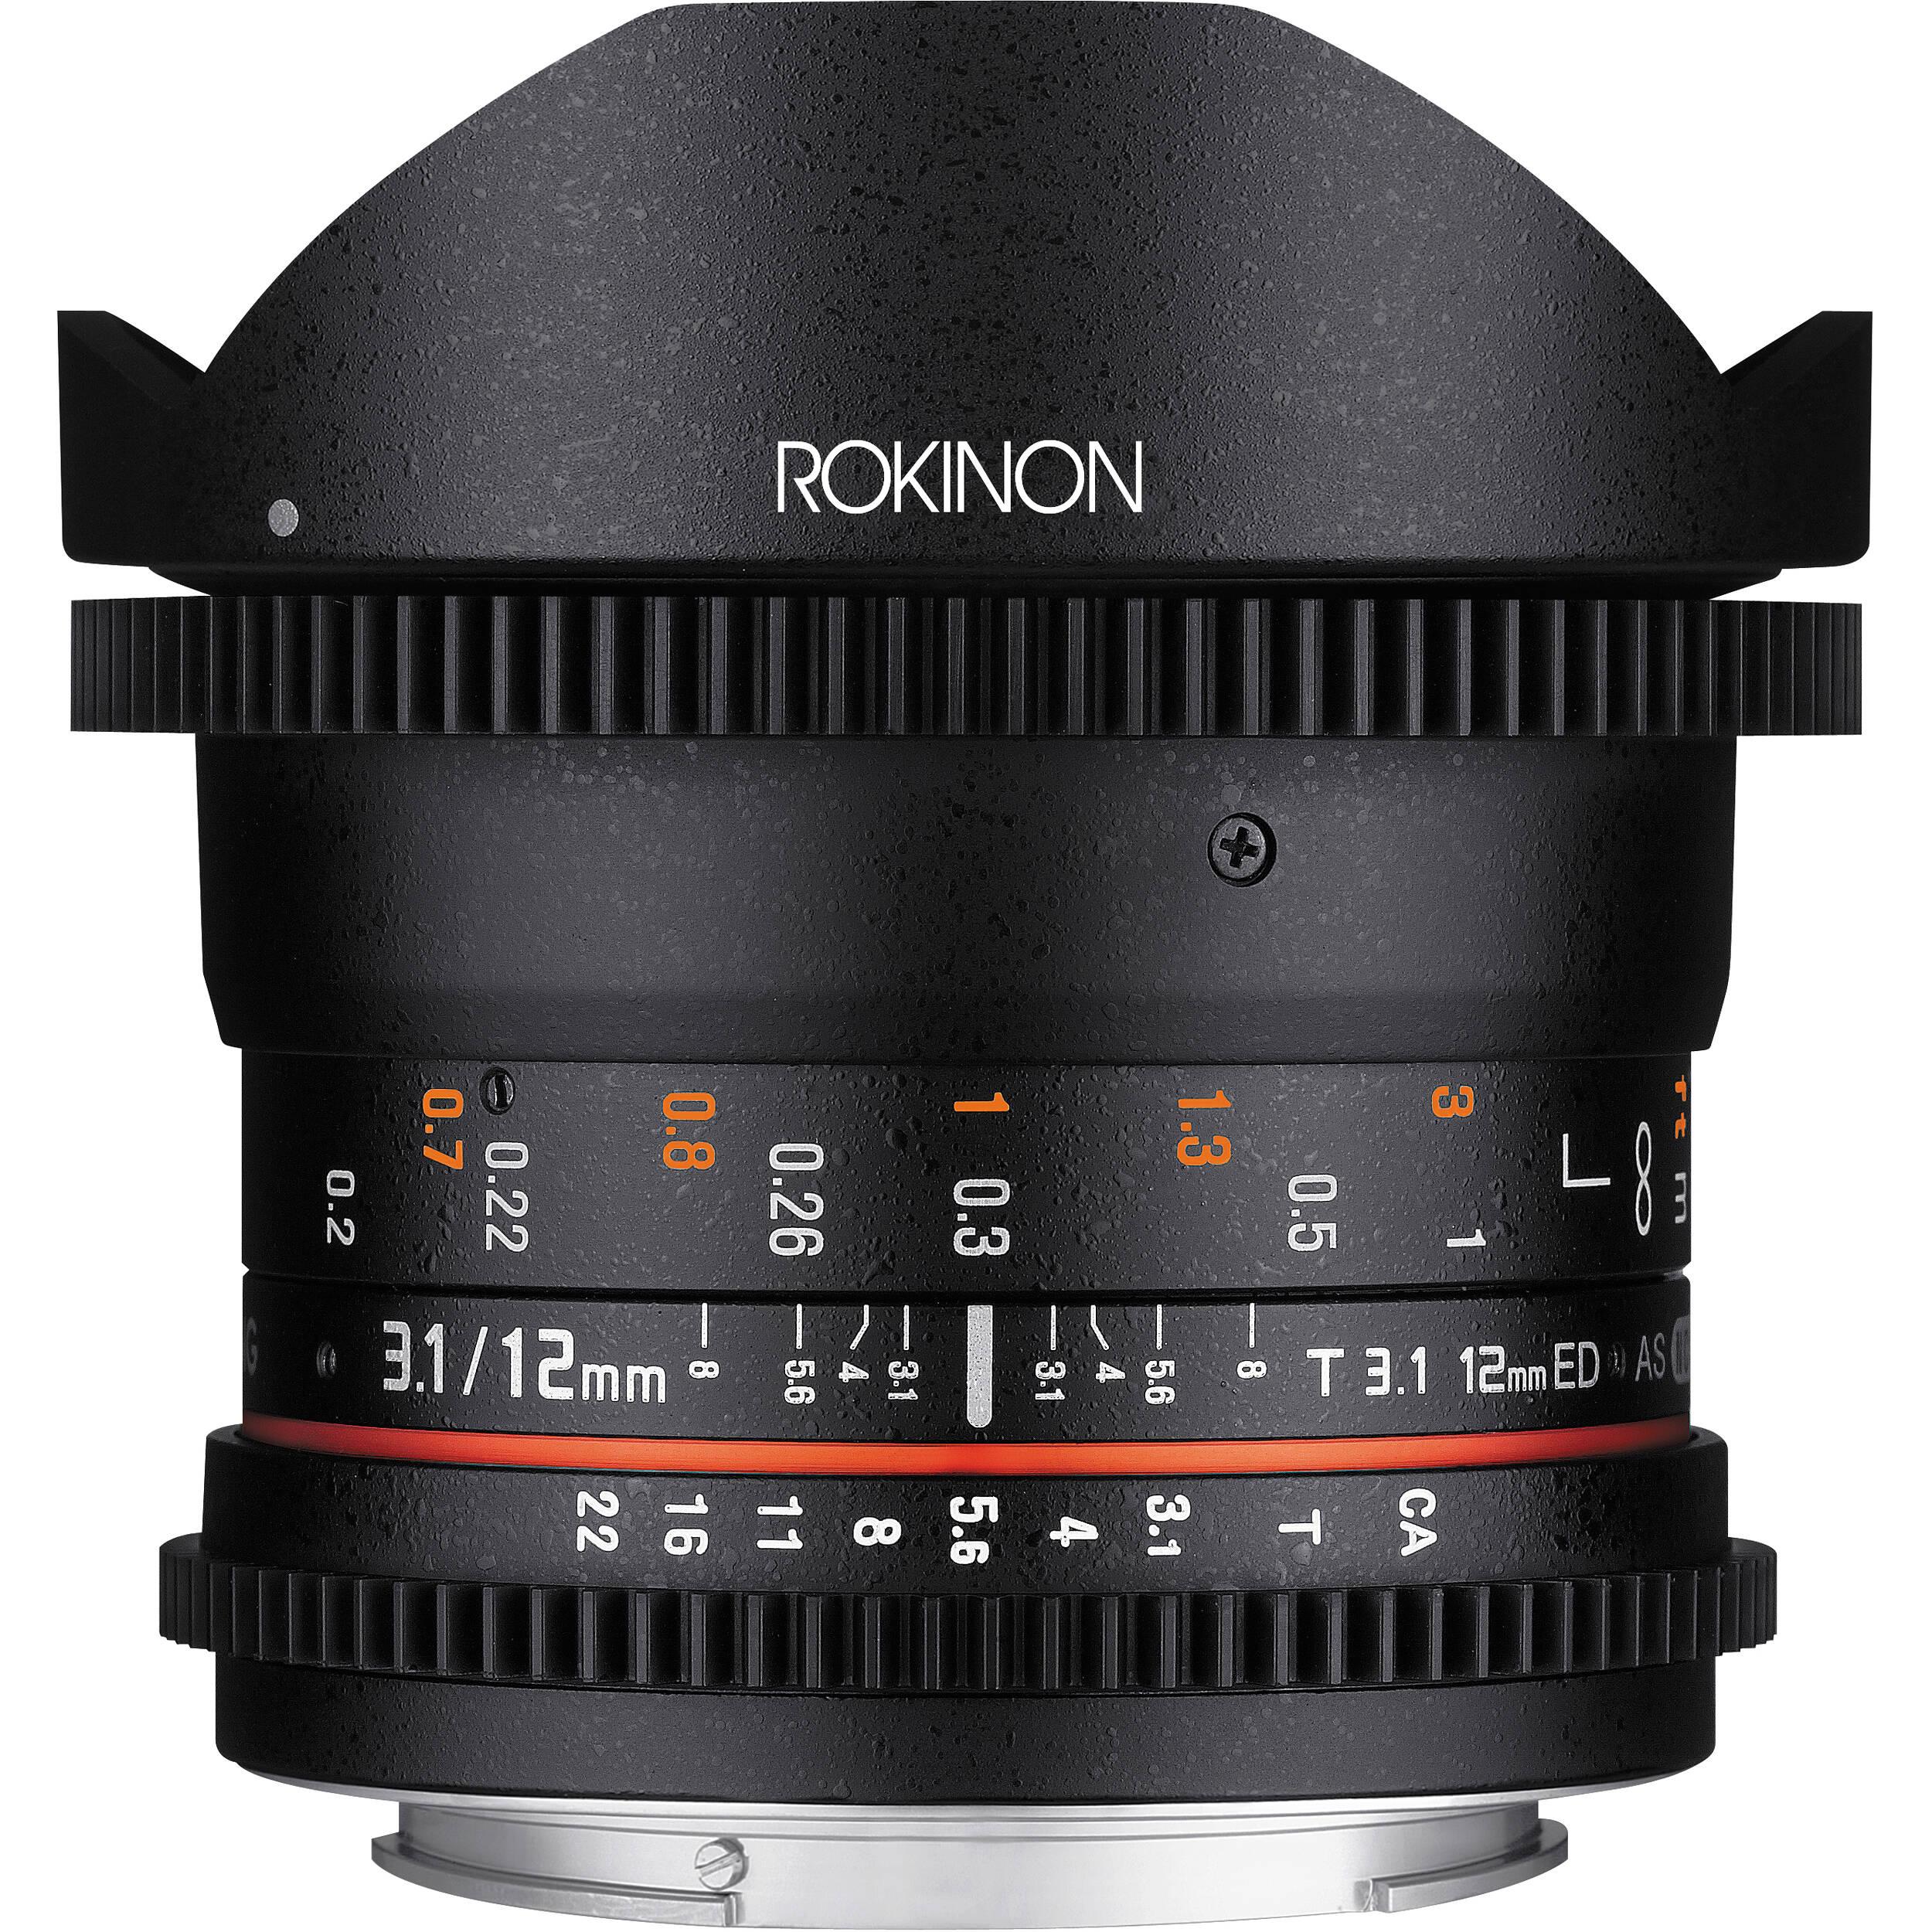 Rokinon 12mm T3 1 Ed As If Ncs Umc Cine Ds Fisheye Lens